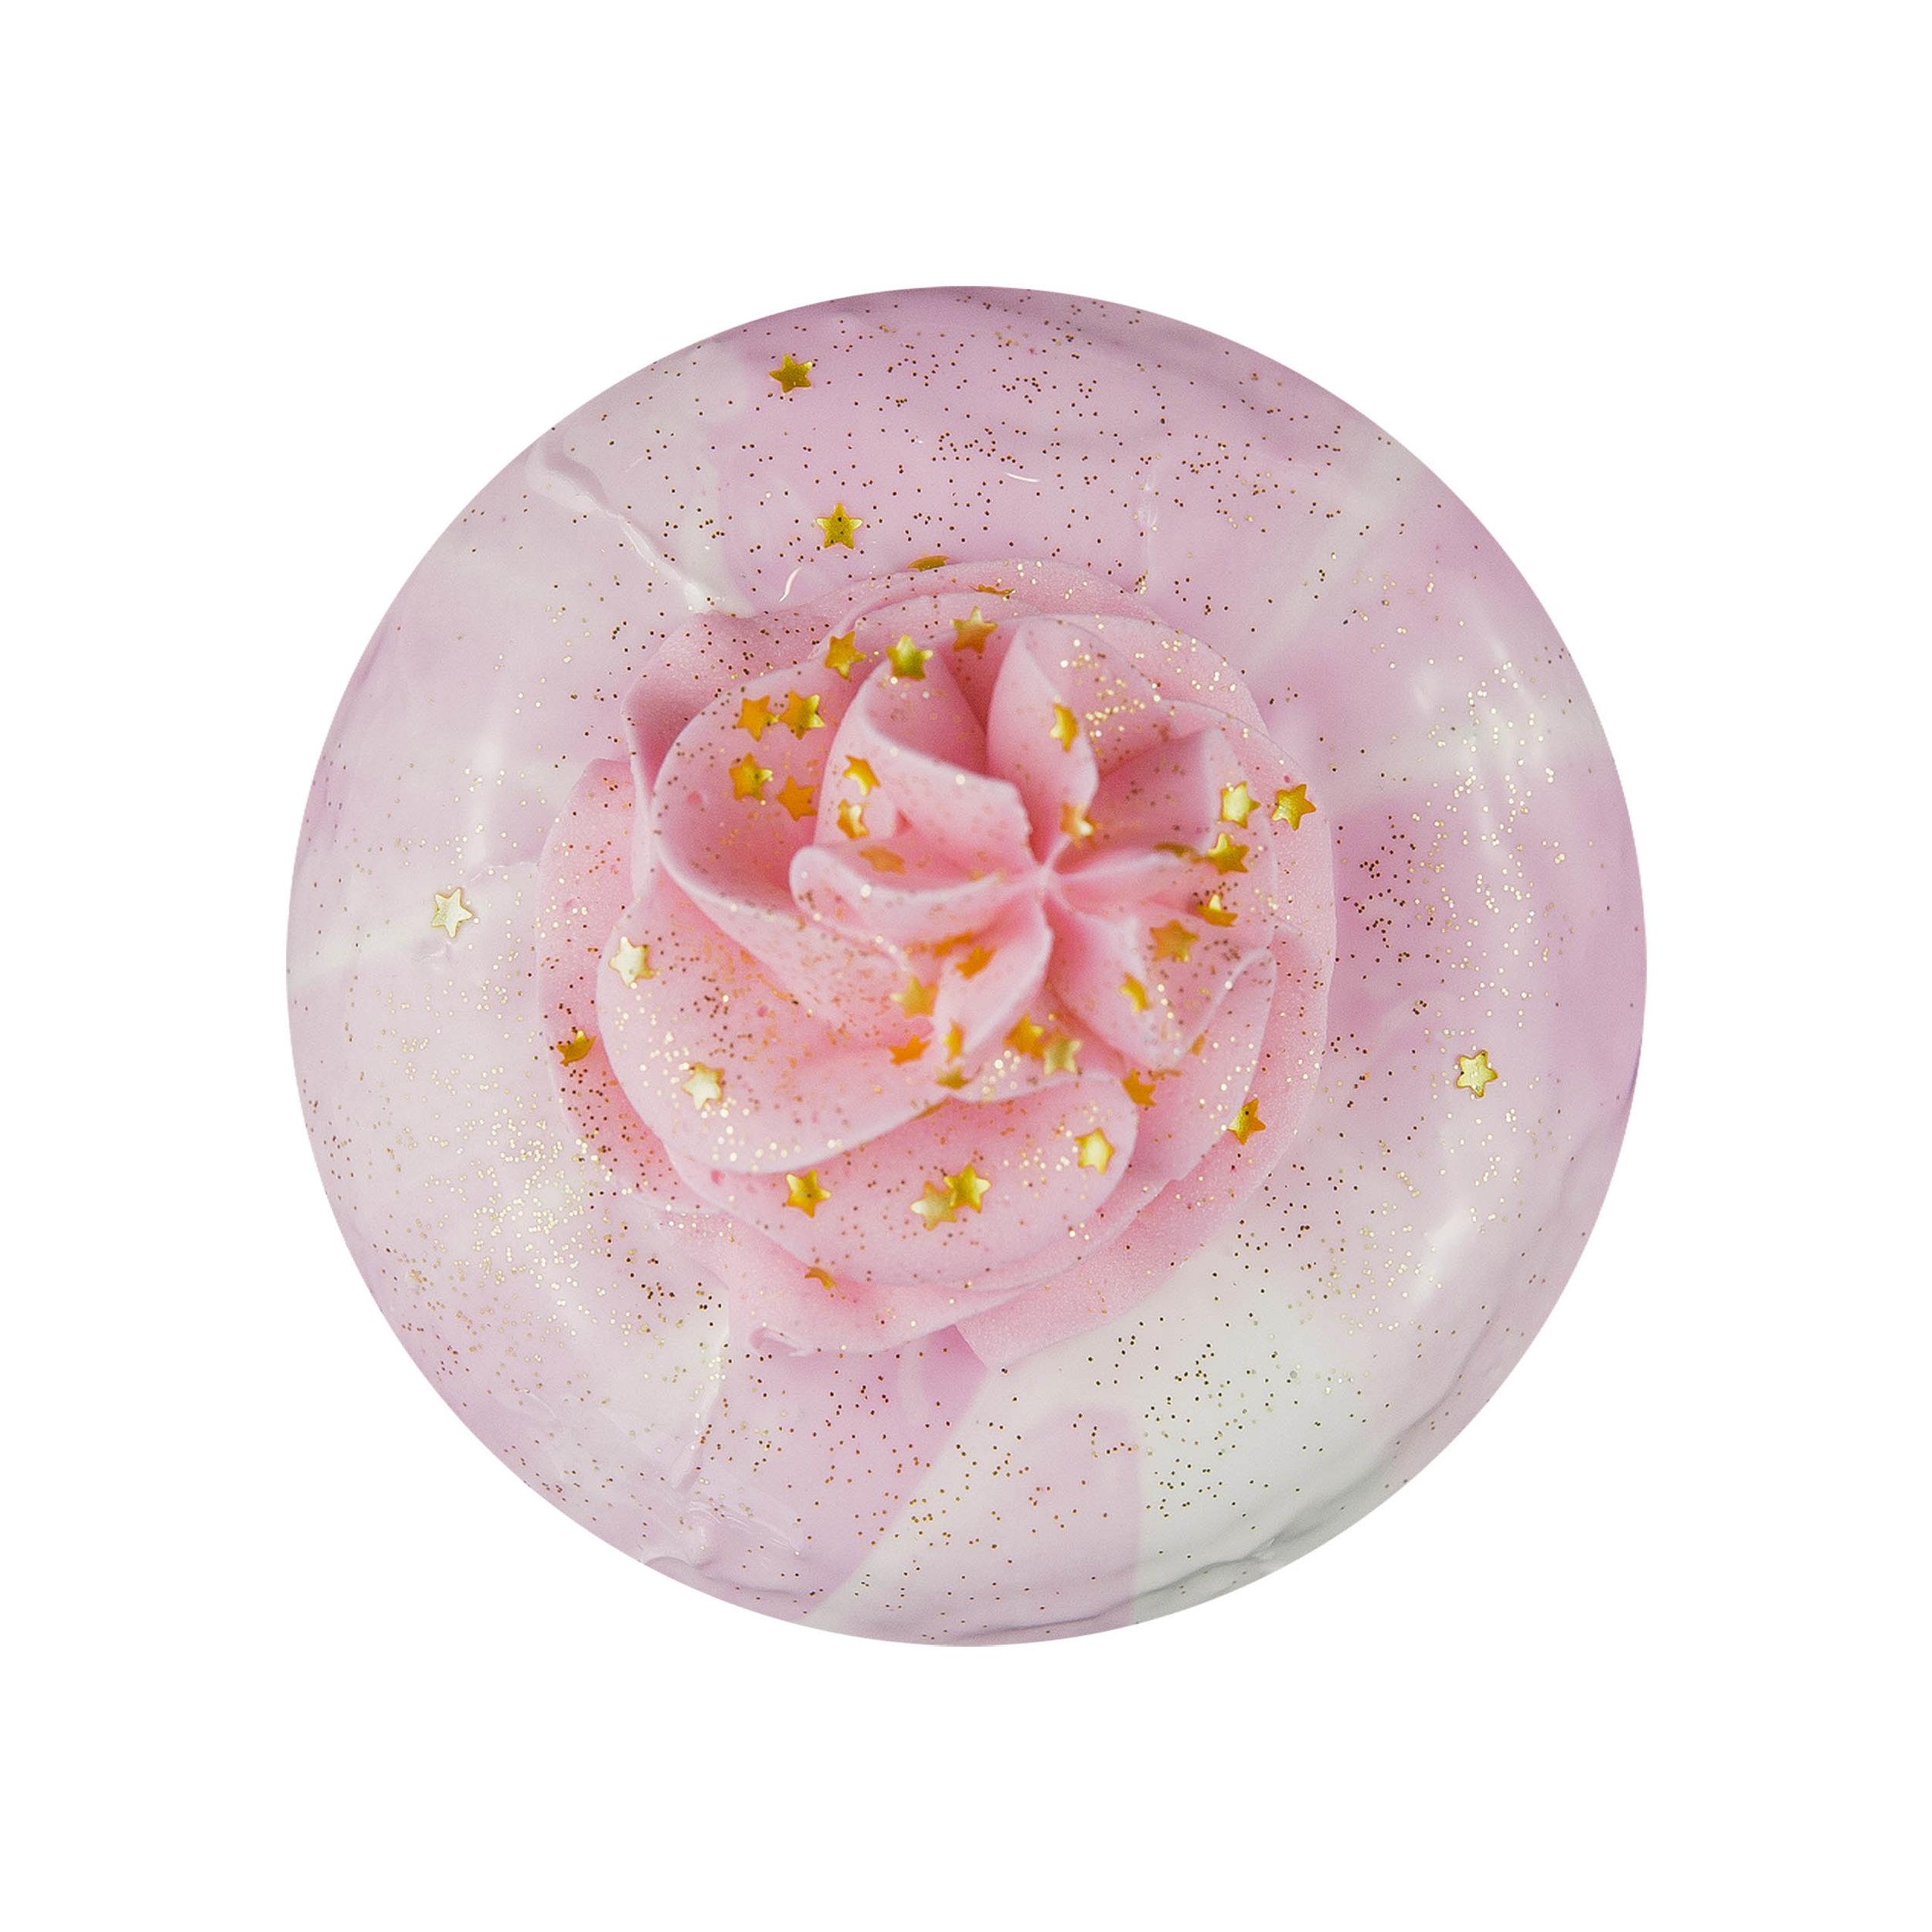 PINK SWIRLIE - VANILLA GALAXY GLAZE+ BUTTERCREAM+ SPRINKLES